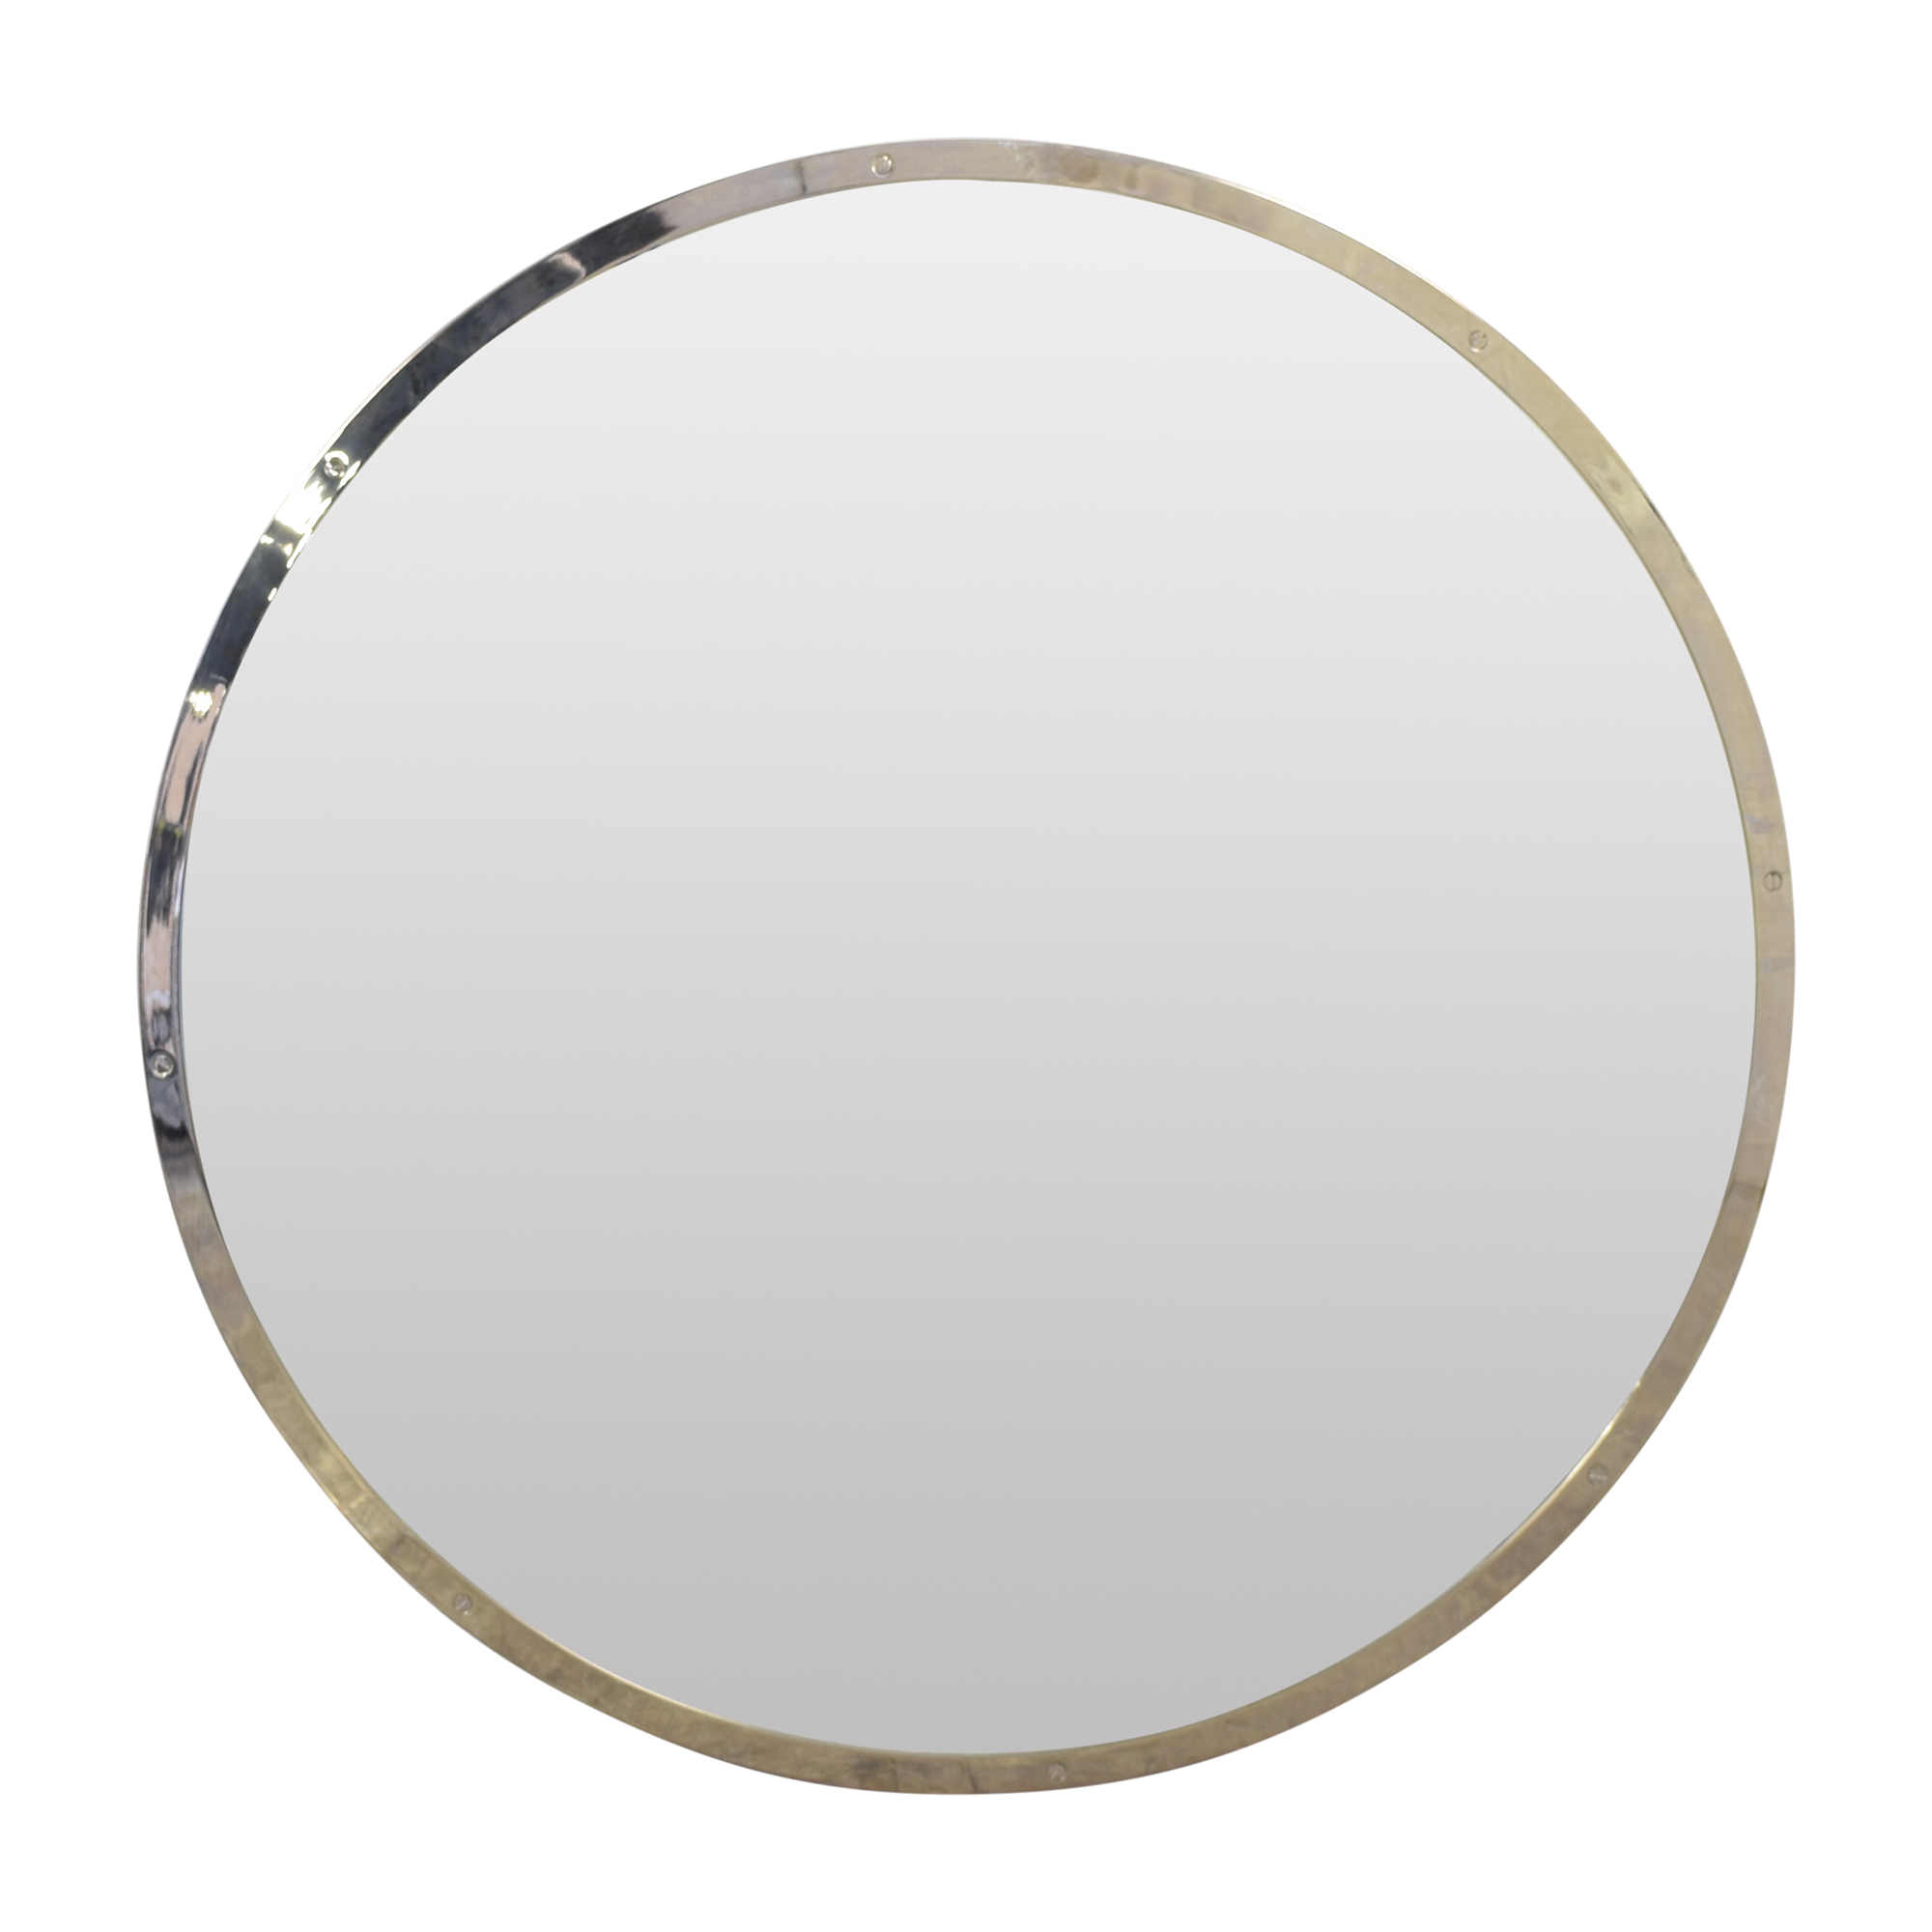 Restoration Hardware Restoration Hardware Bistro Round Mirror pa